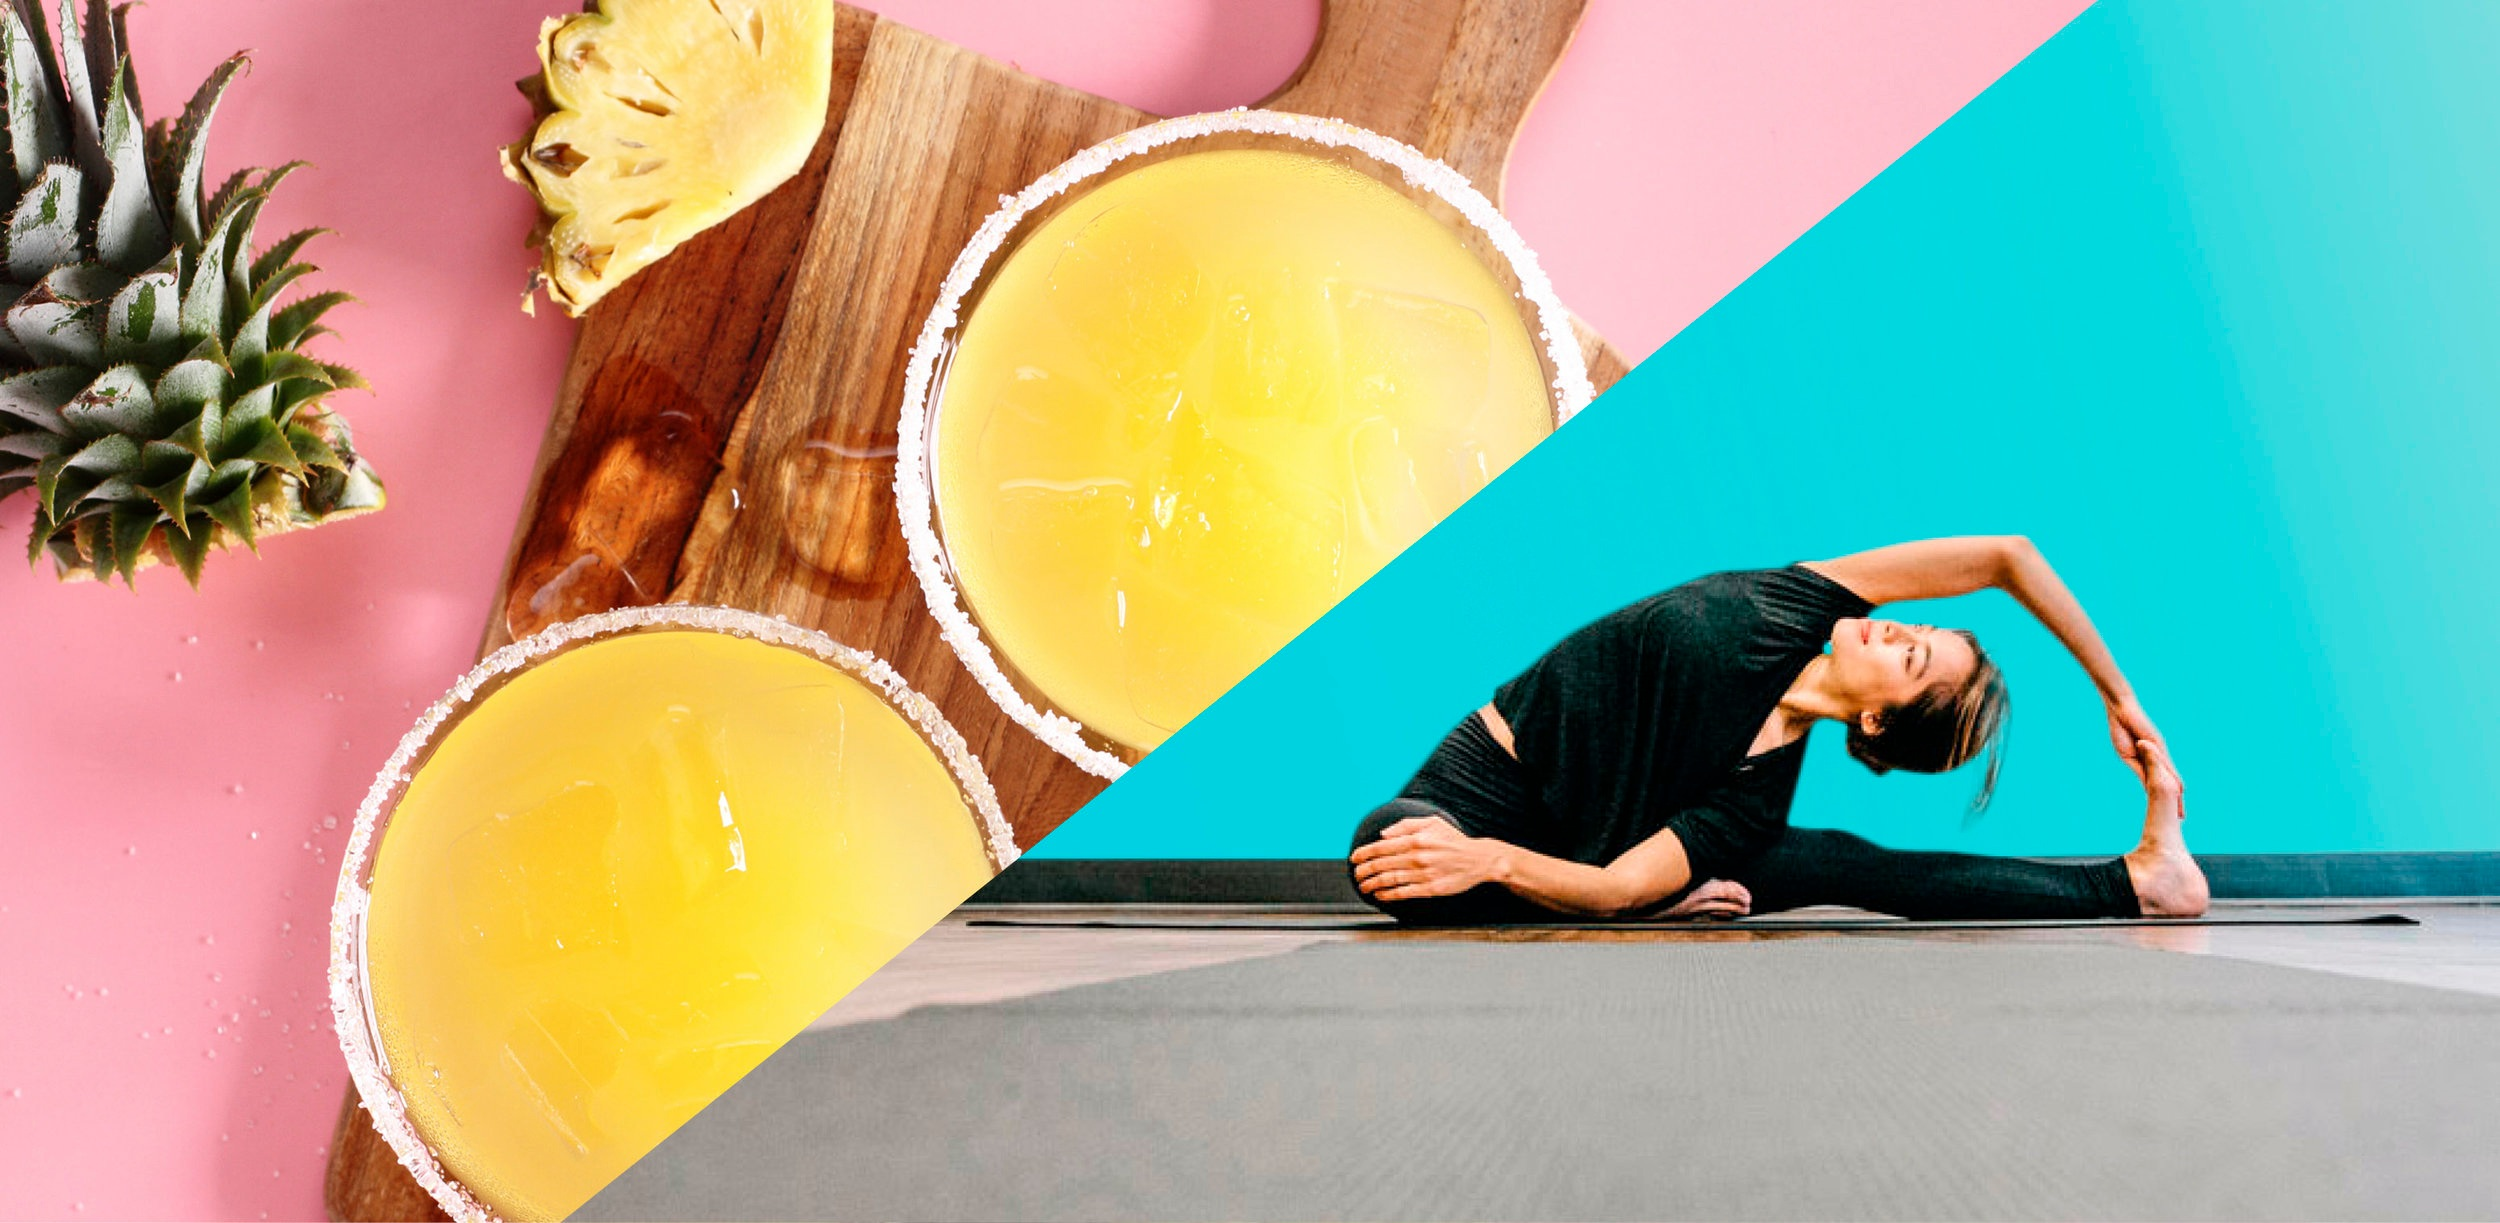 eat+stretch+nap+whirlpool+yoga